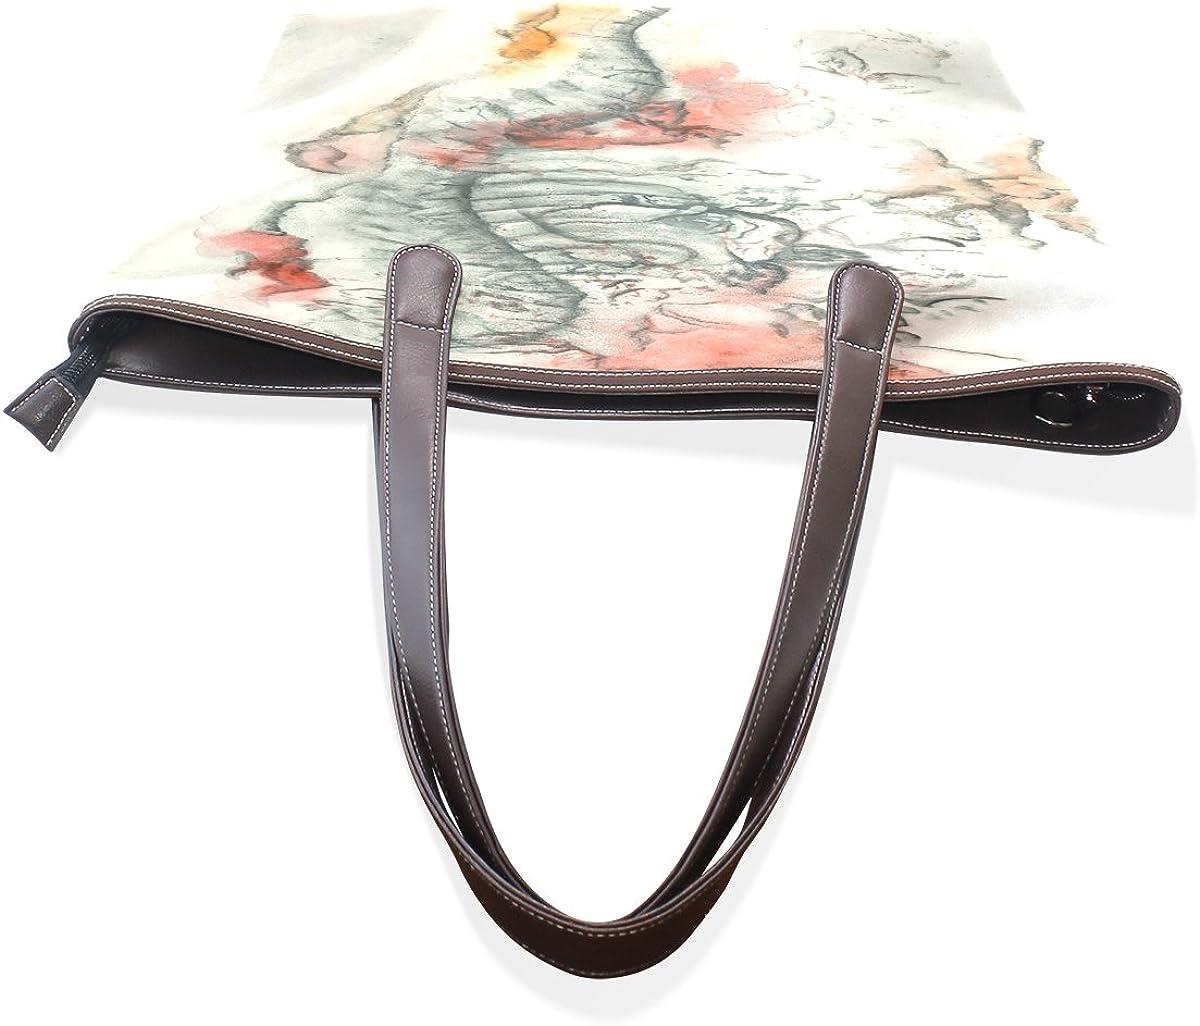 Mr.Weng Household Graffiti Pattern Leather Handbags Satchel ShoulderBag for Women